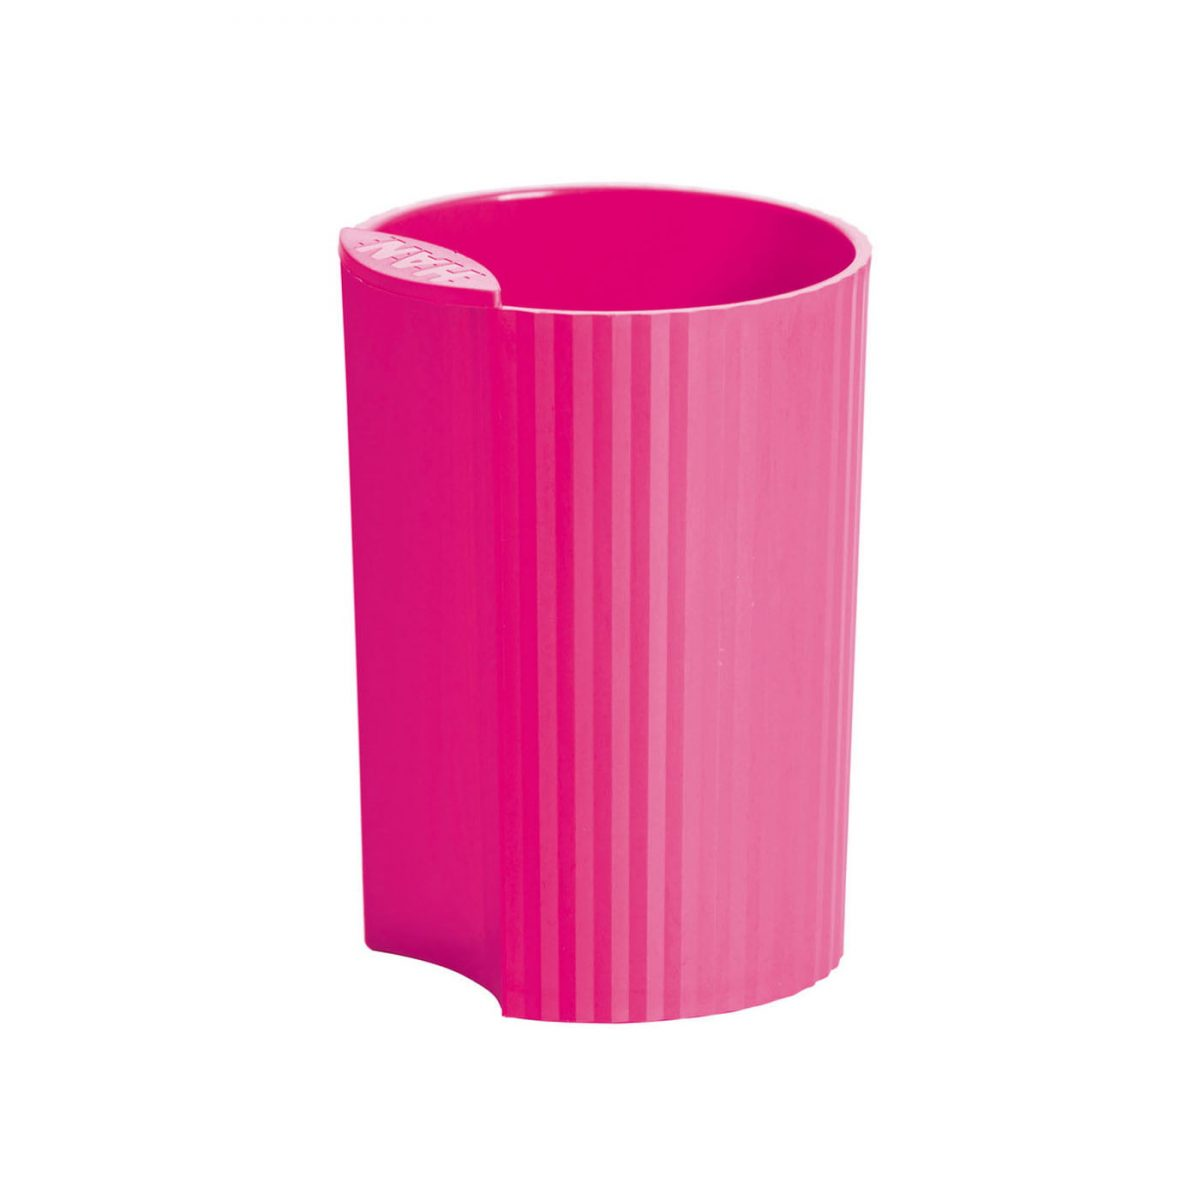 Suport pentru instrumente de scris, HAN Loop Trend-Colours - roz